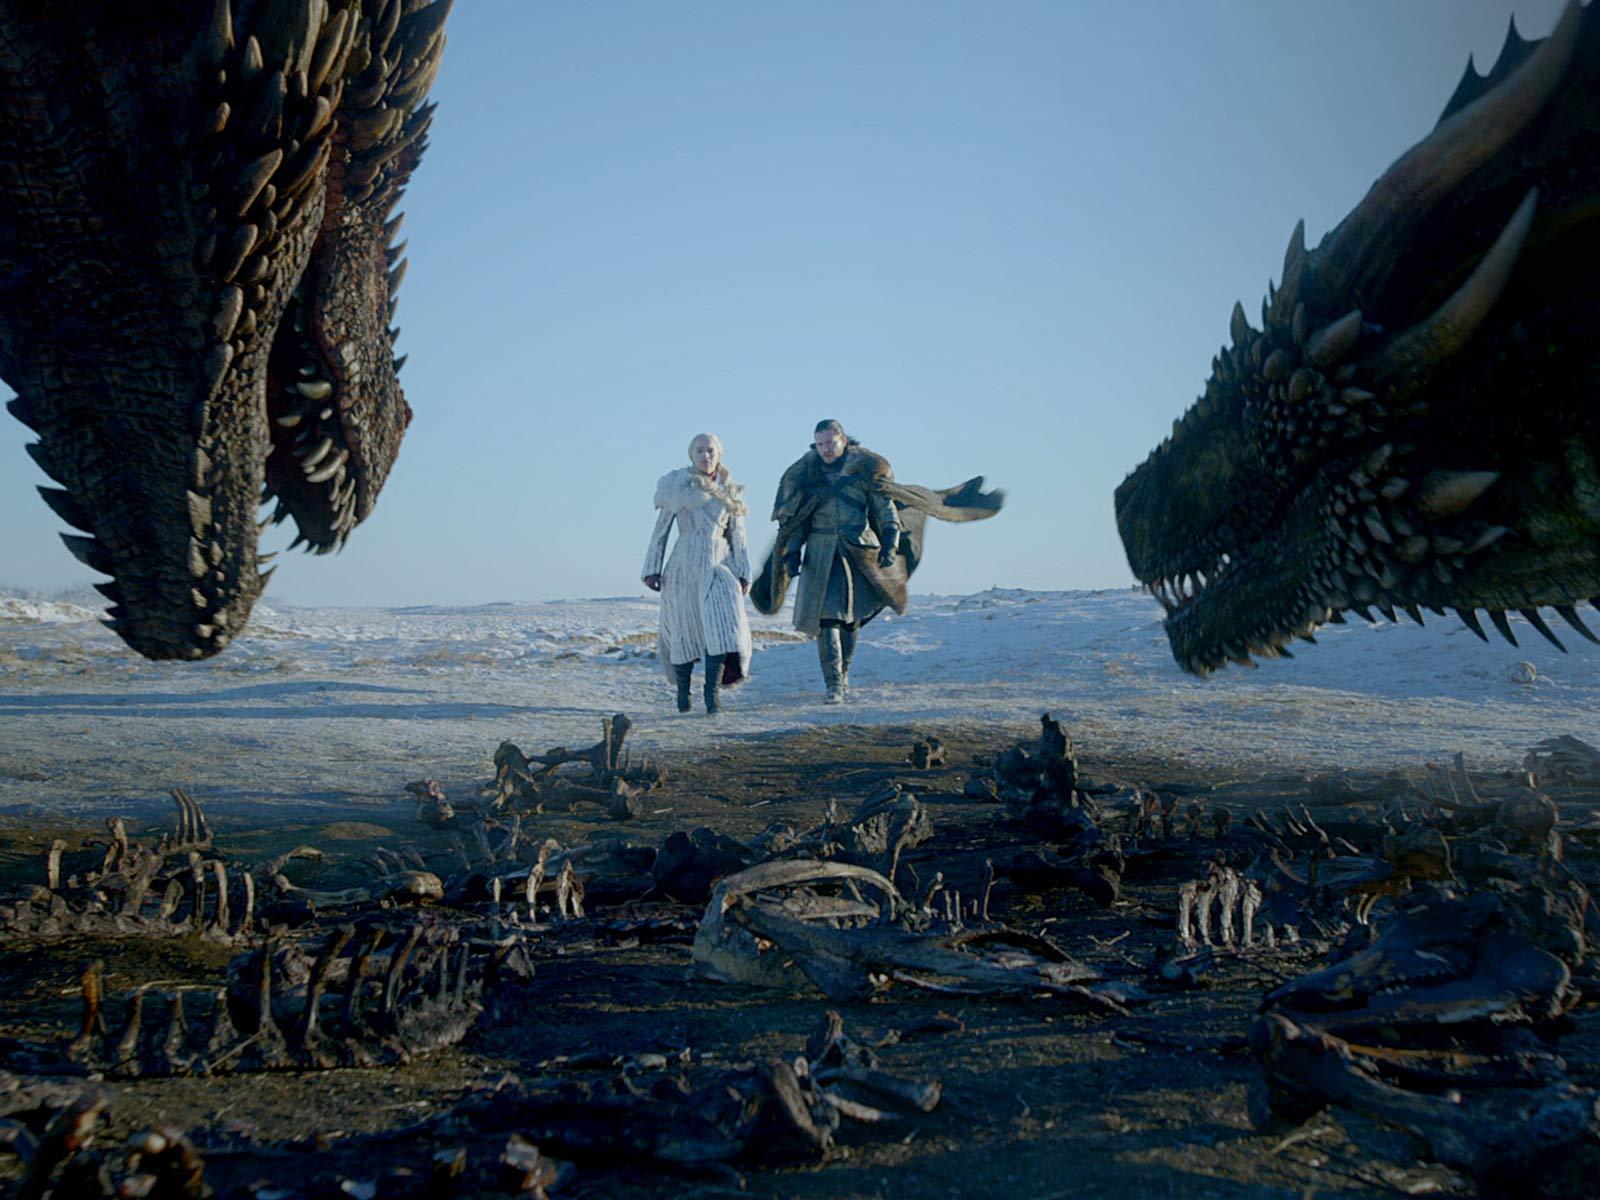 Amazon com: Watch Game of Thrones - Season 8 | Prime Video